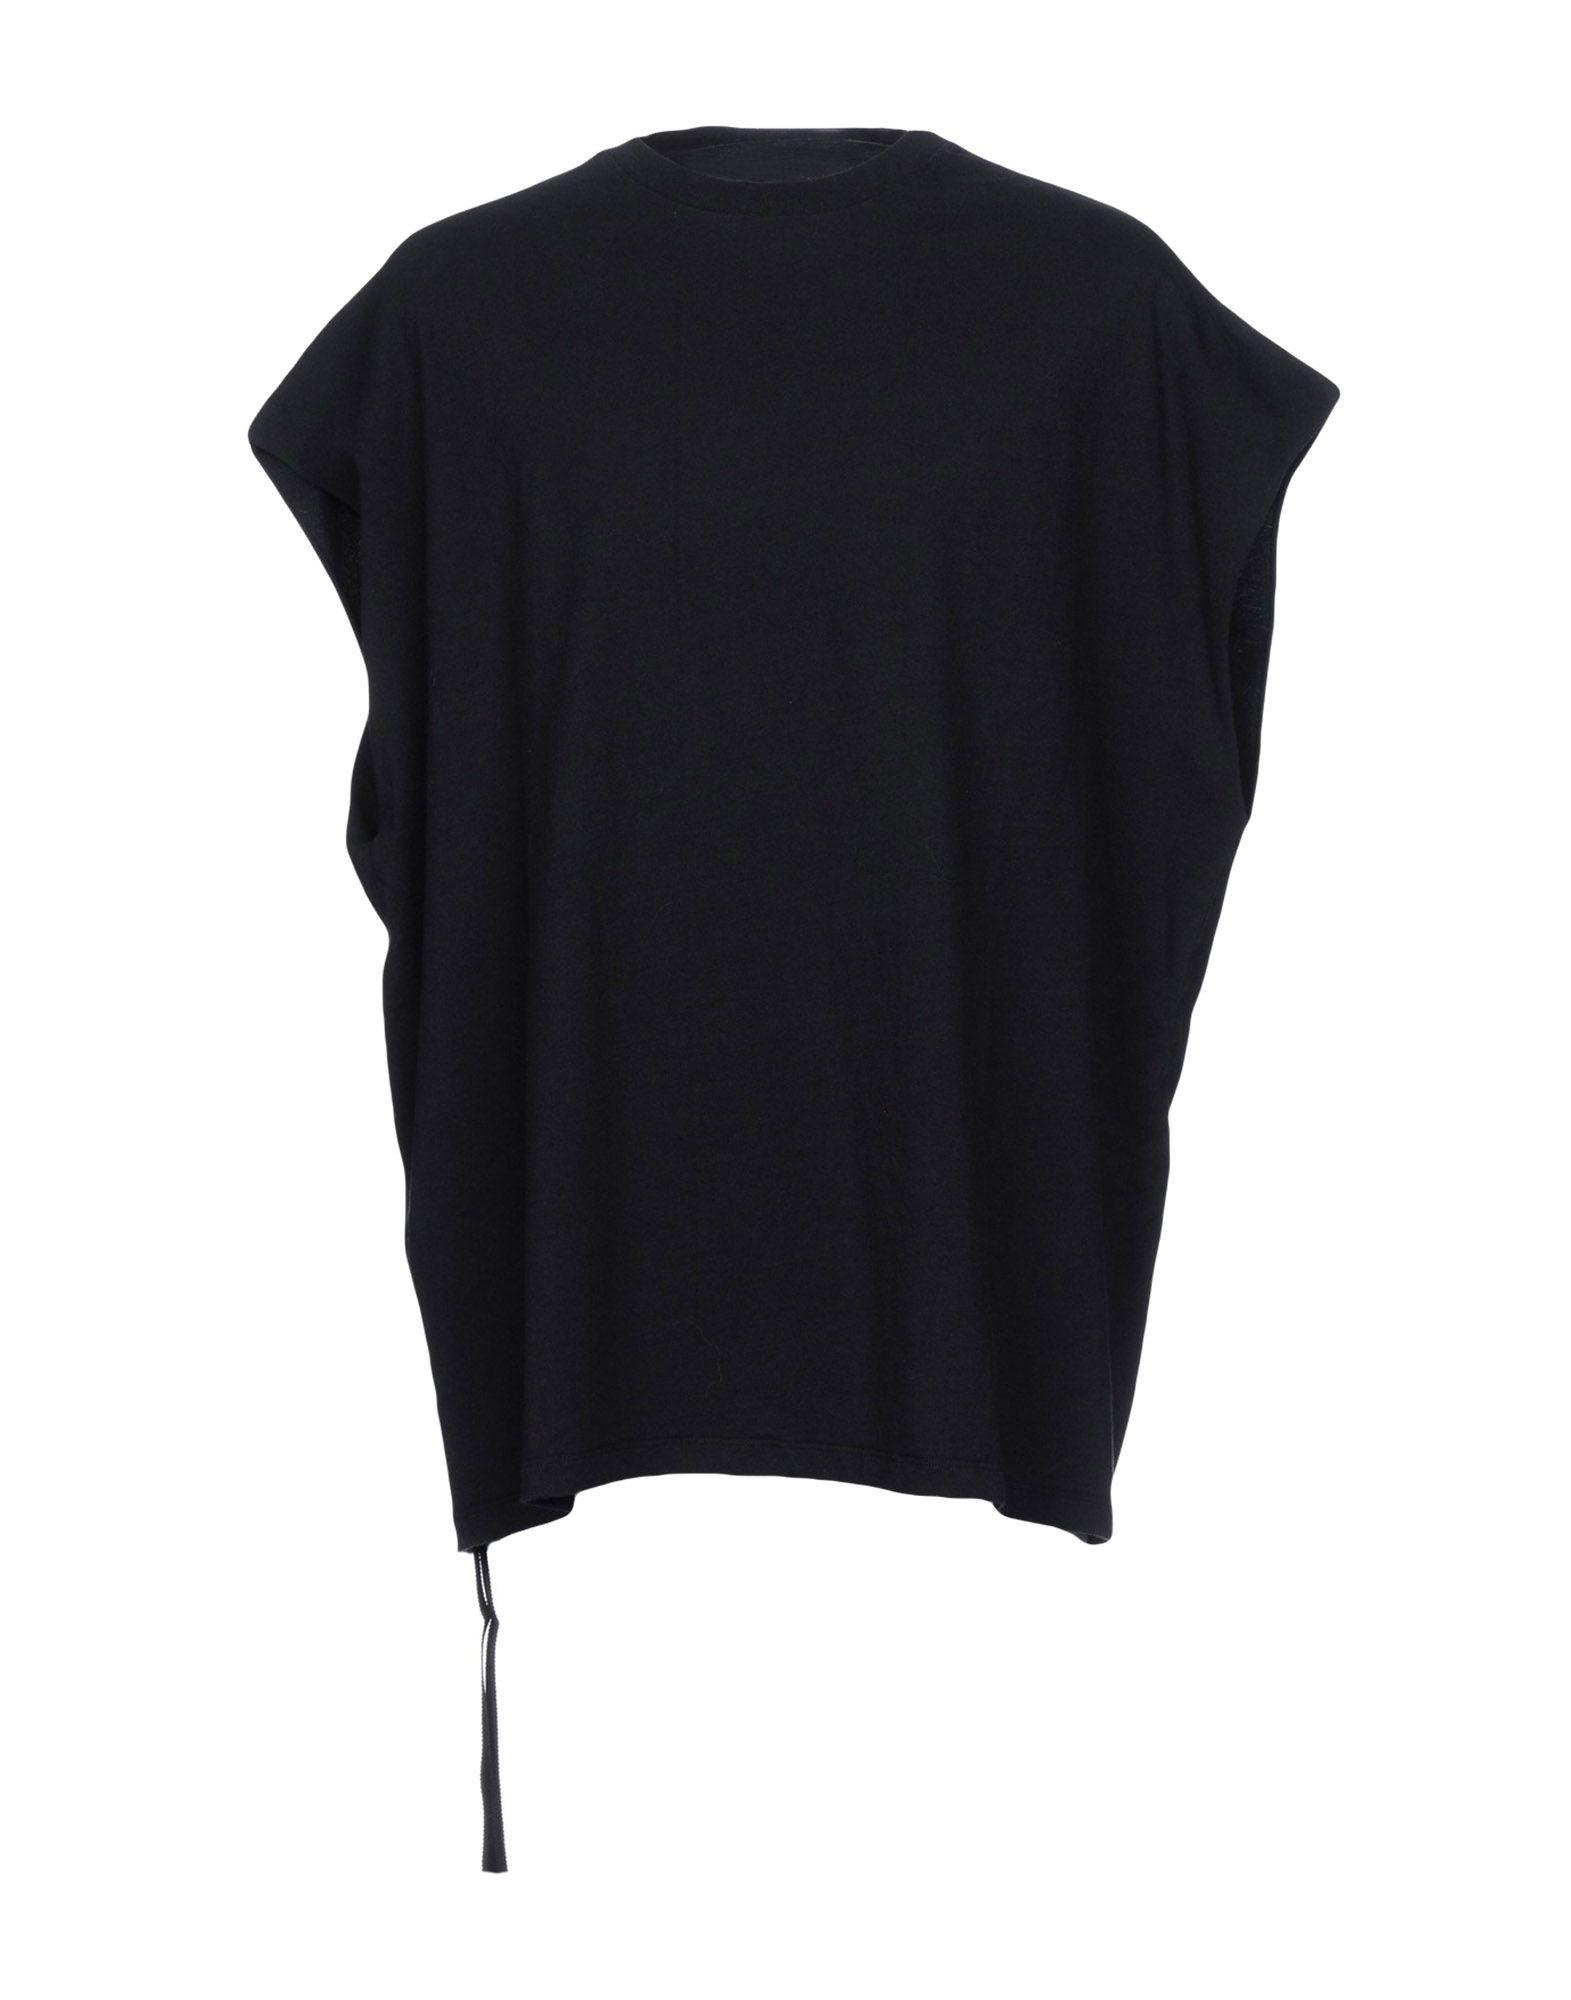 T-Shirt Ben Taverniti™ Unravel Project Donna - Acquista online su